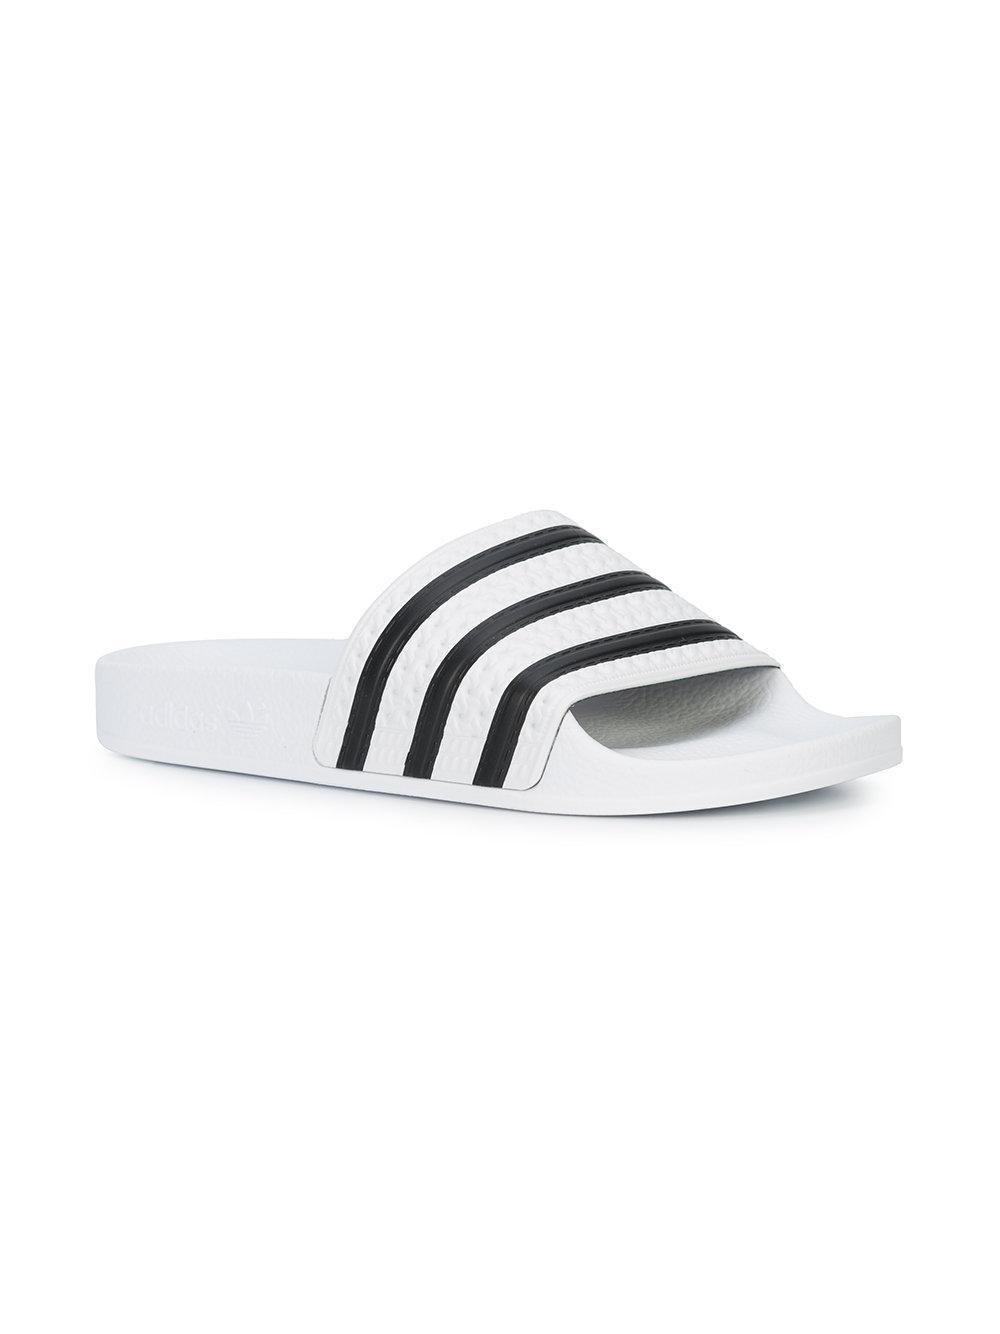 2cae1cb36303 Lyst - adidas Originals Adilette Stripe Slides in White for Men